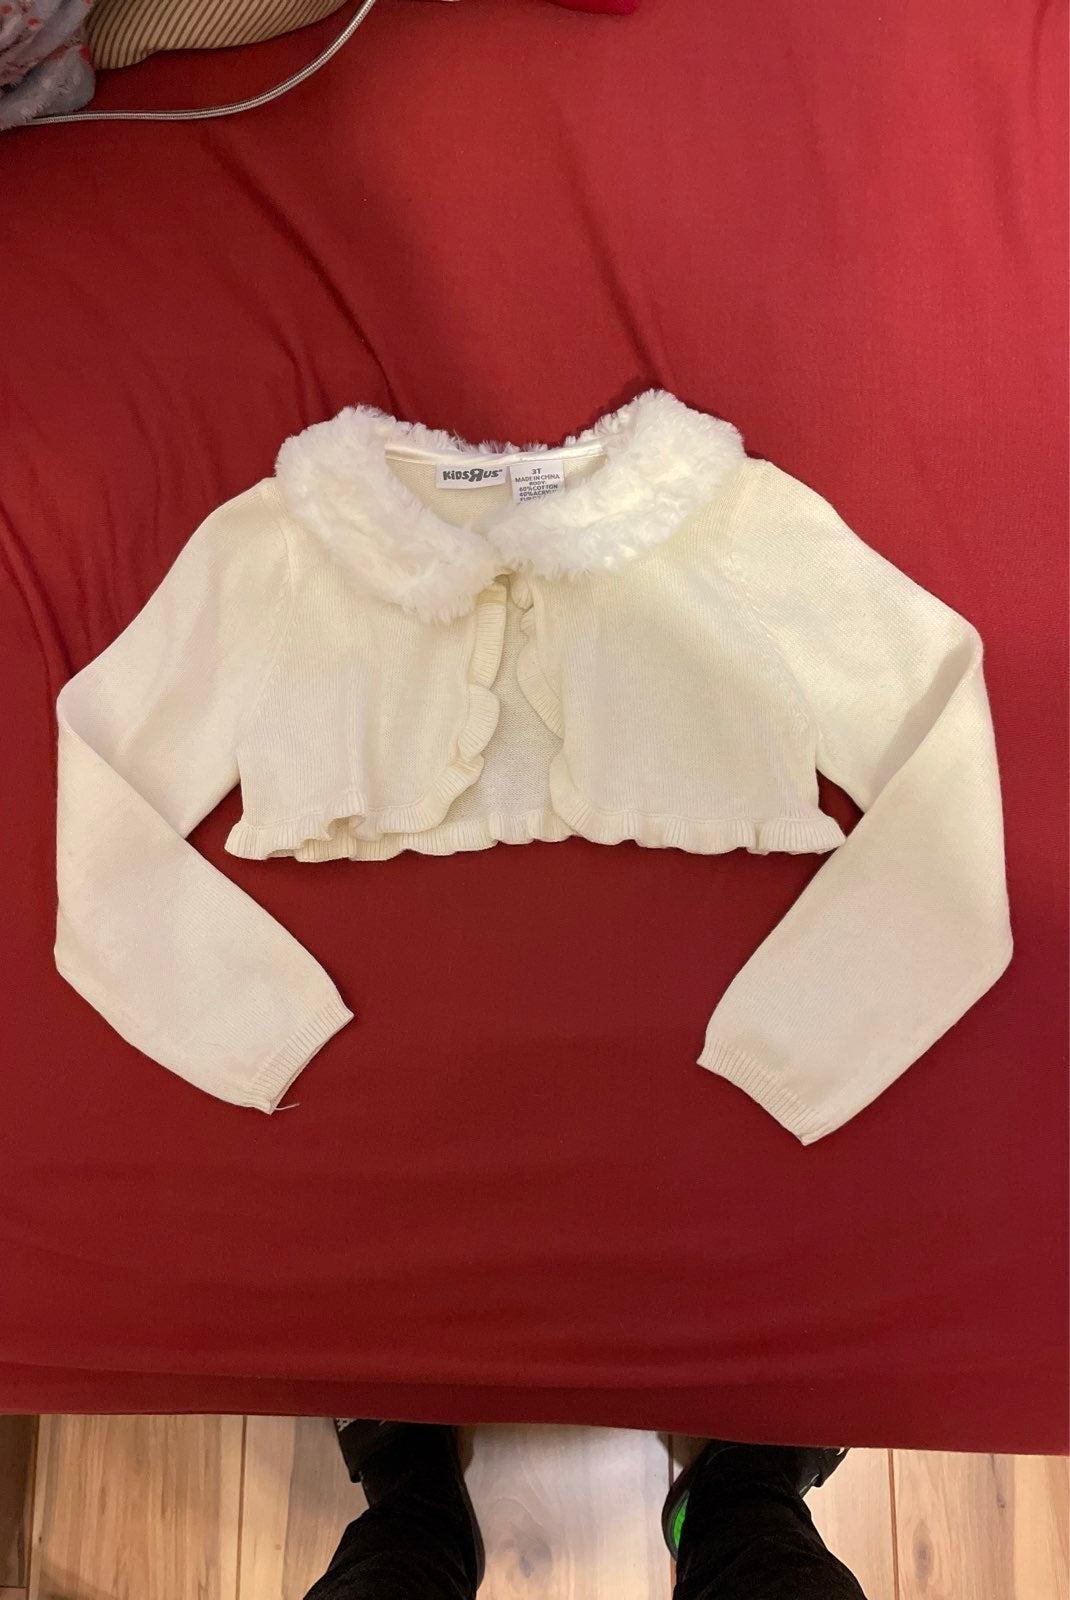 Kids R Us White Sweater Size 3T